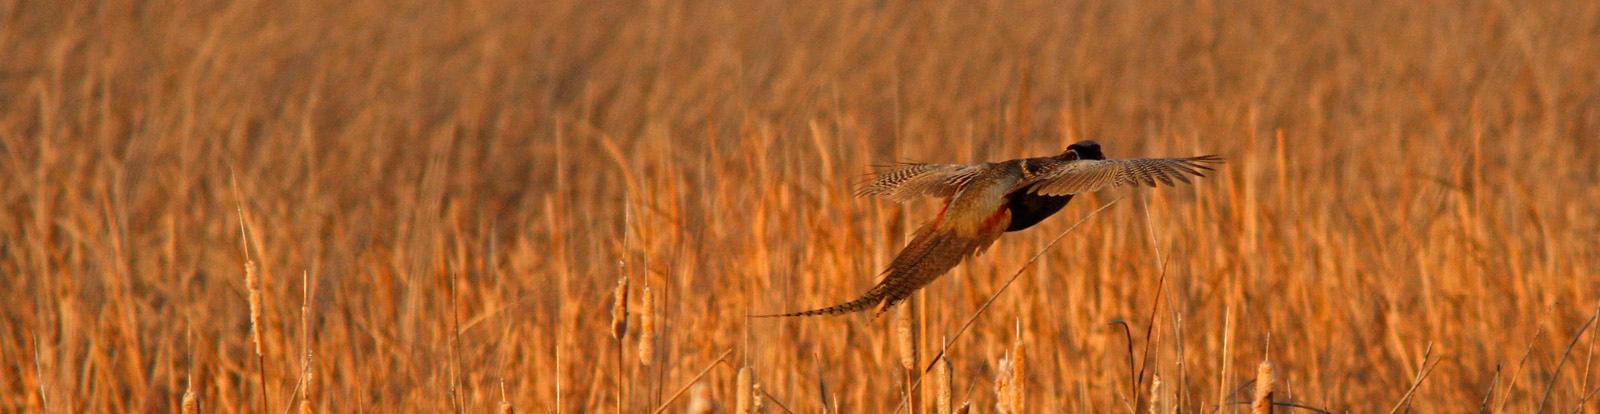 Pheasant in Flight, Colusa WLR